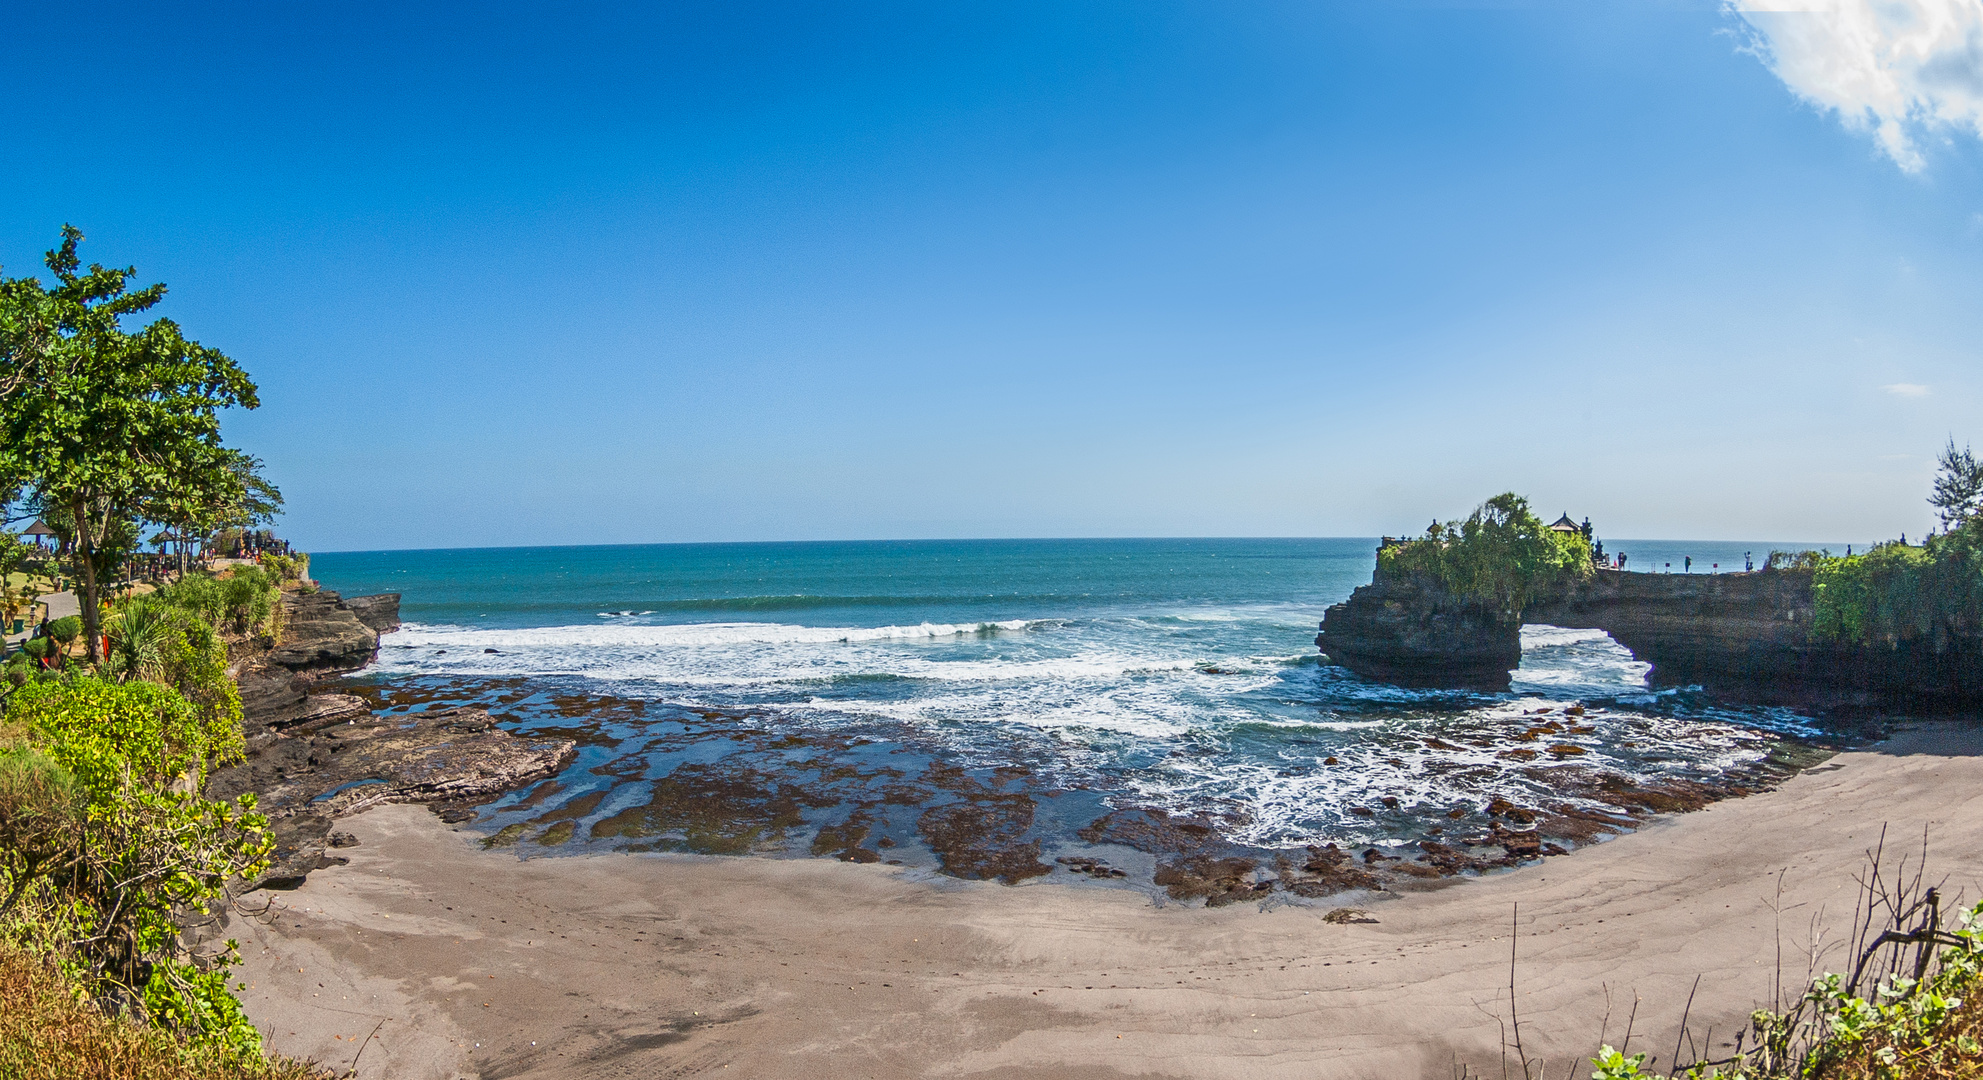 Pura Batu Bolong mit dem Strand